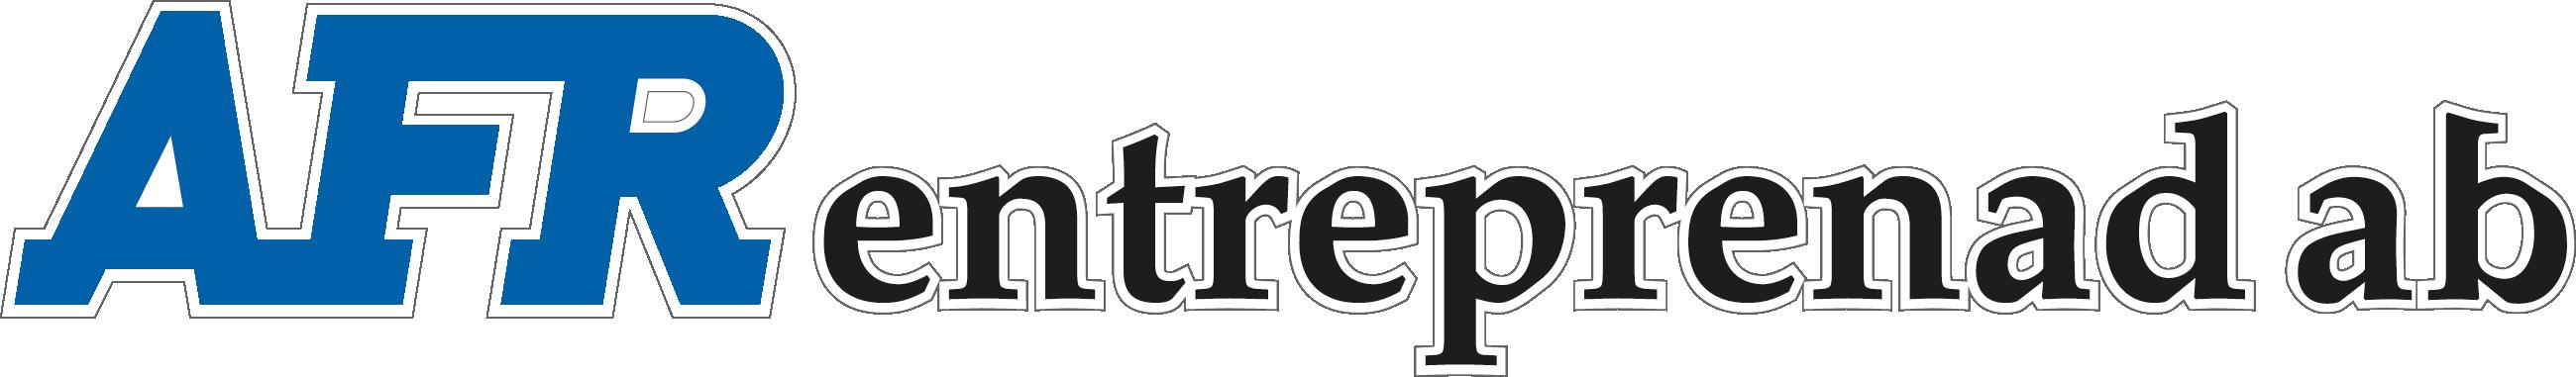 AFR Entreprenad Logotyp